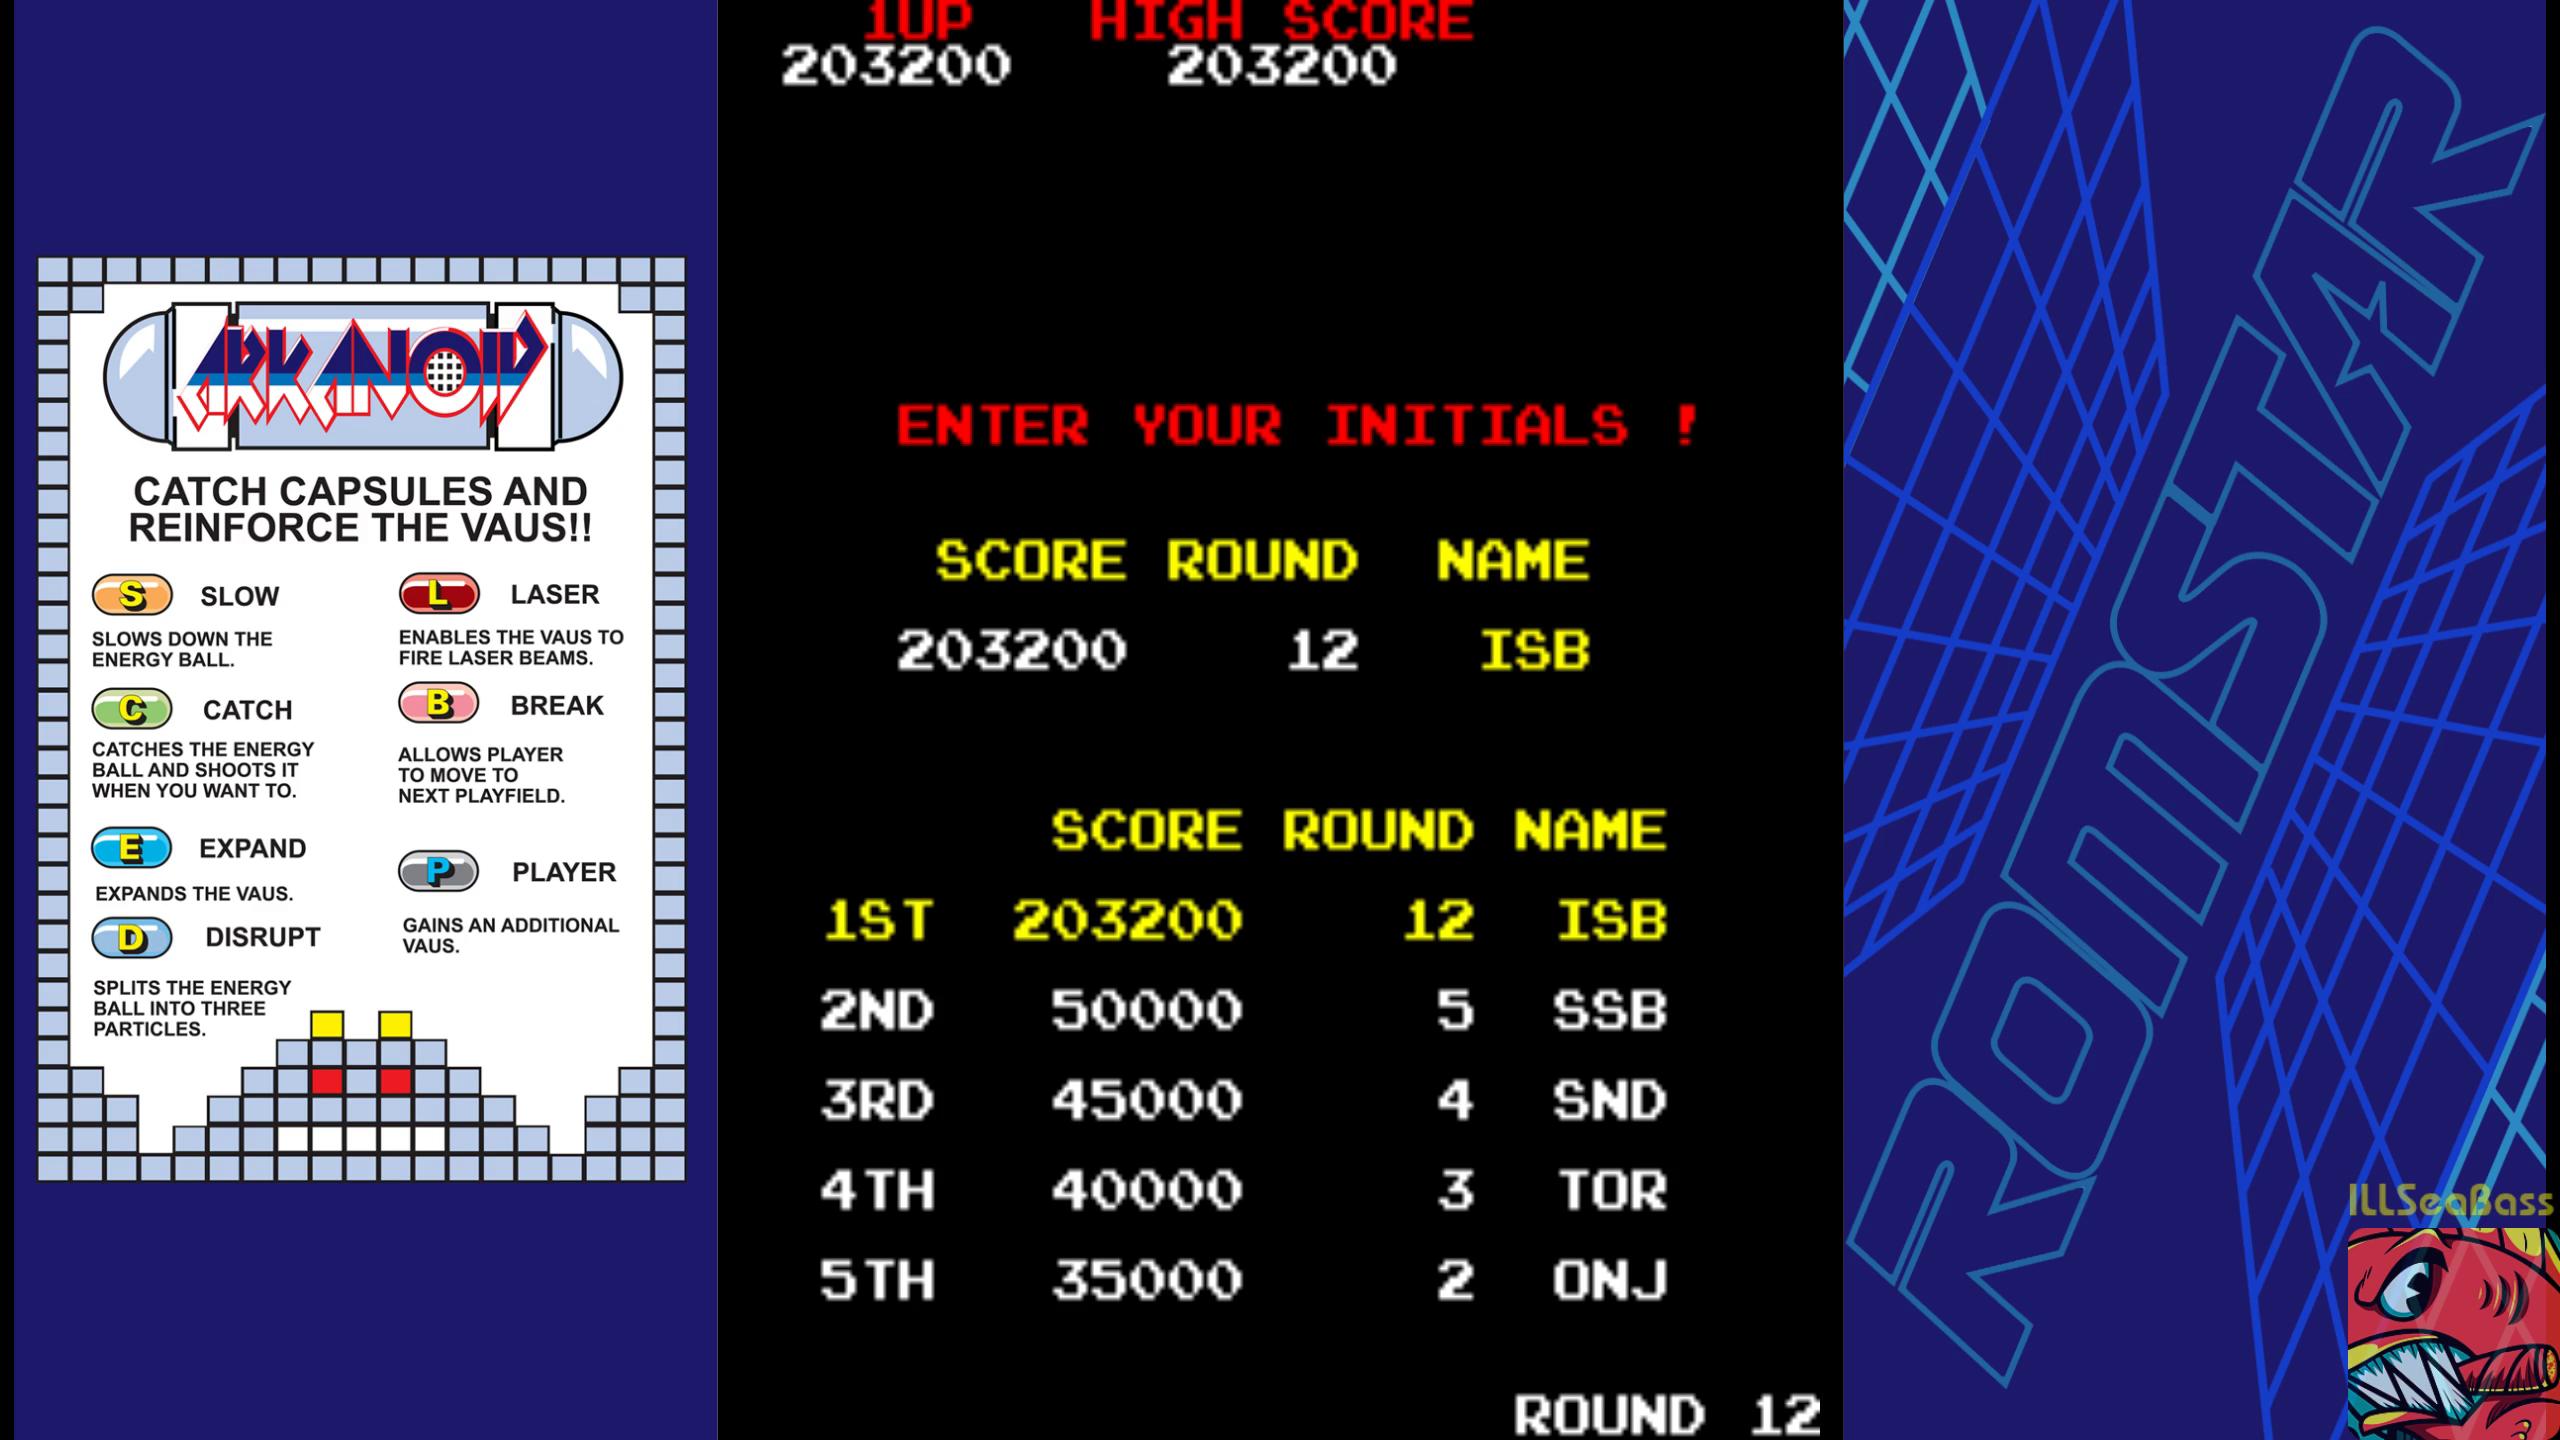 ILLSeaBass: Arkanoid (Arcade Emulated / M.A.M.E.) 203,200 points on 2019-03-02 21:21:21